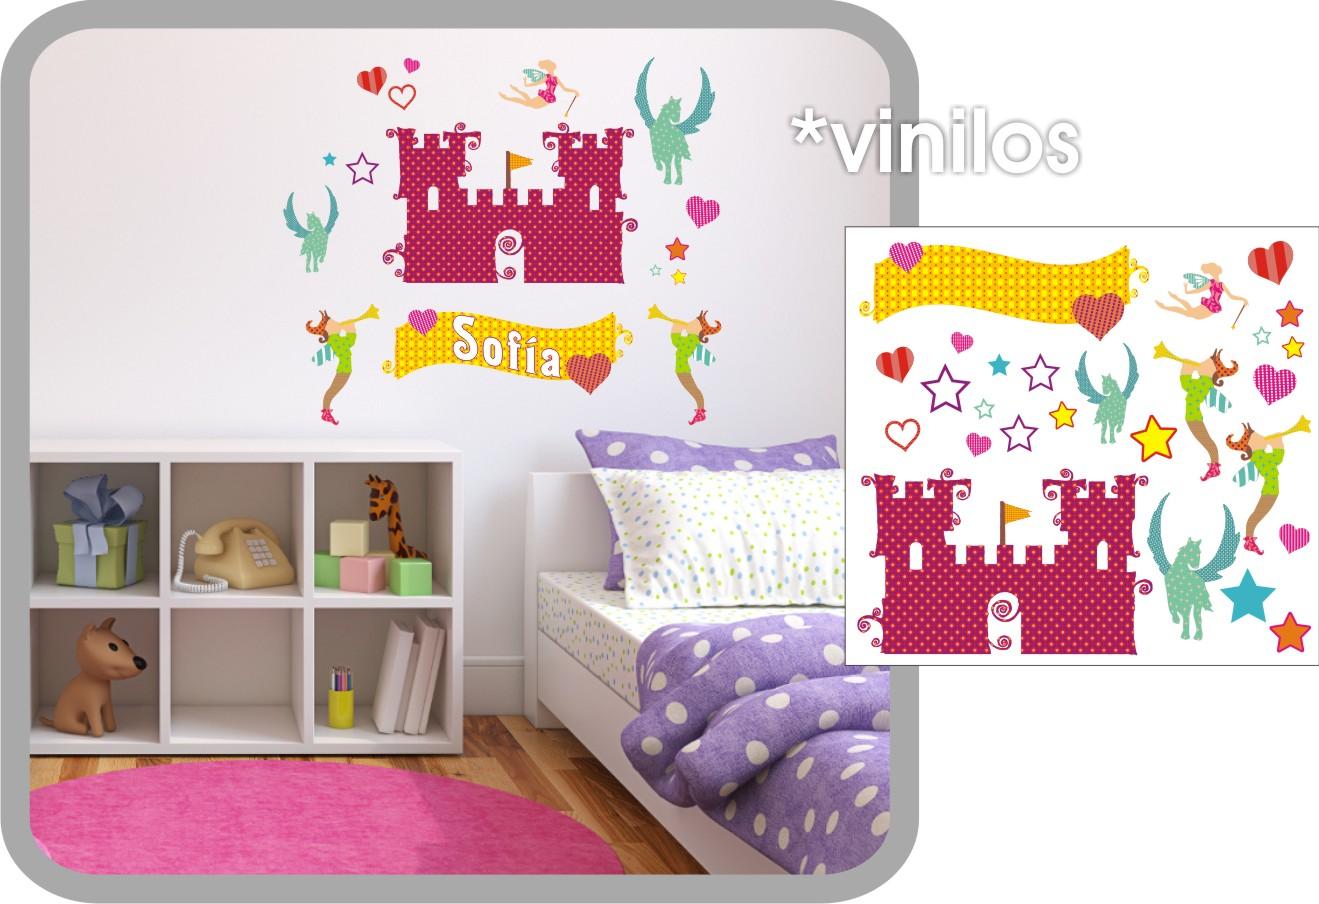 Vinilos decorativos infantiles diseniaria tienda for Vinilos infantiles hadas